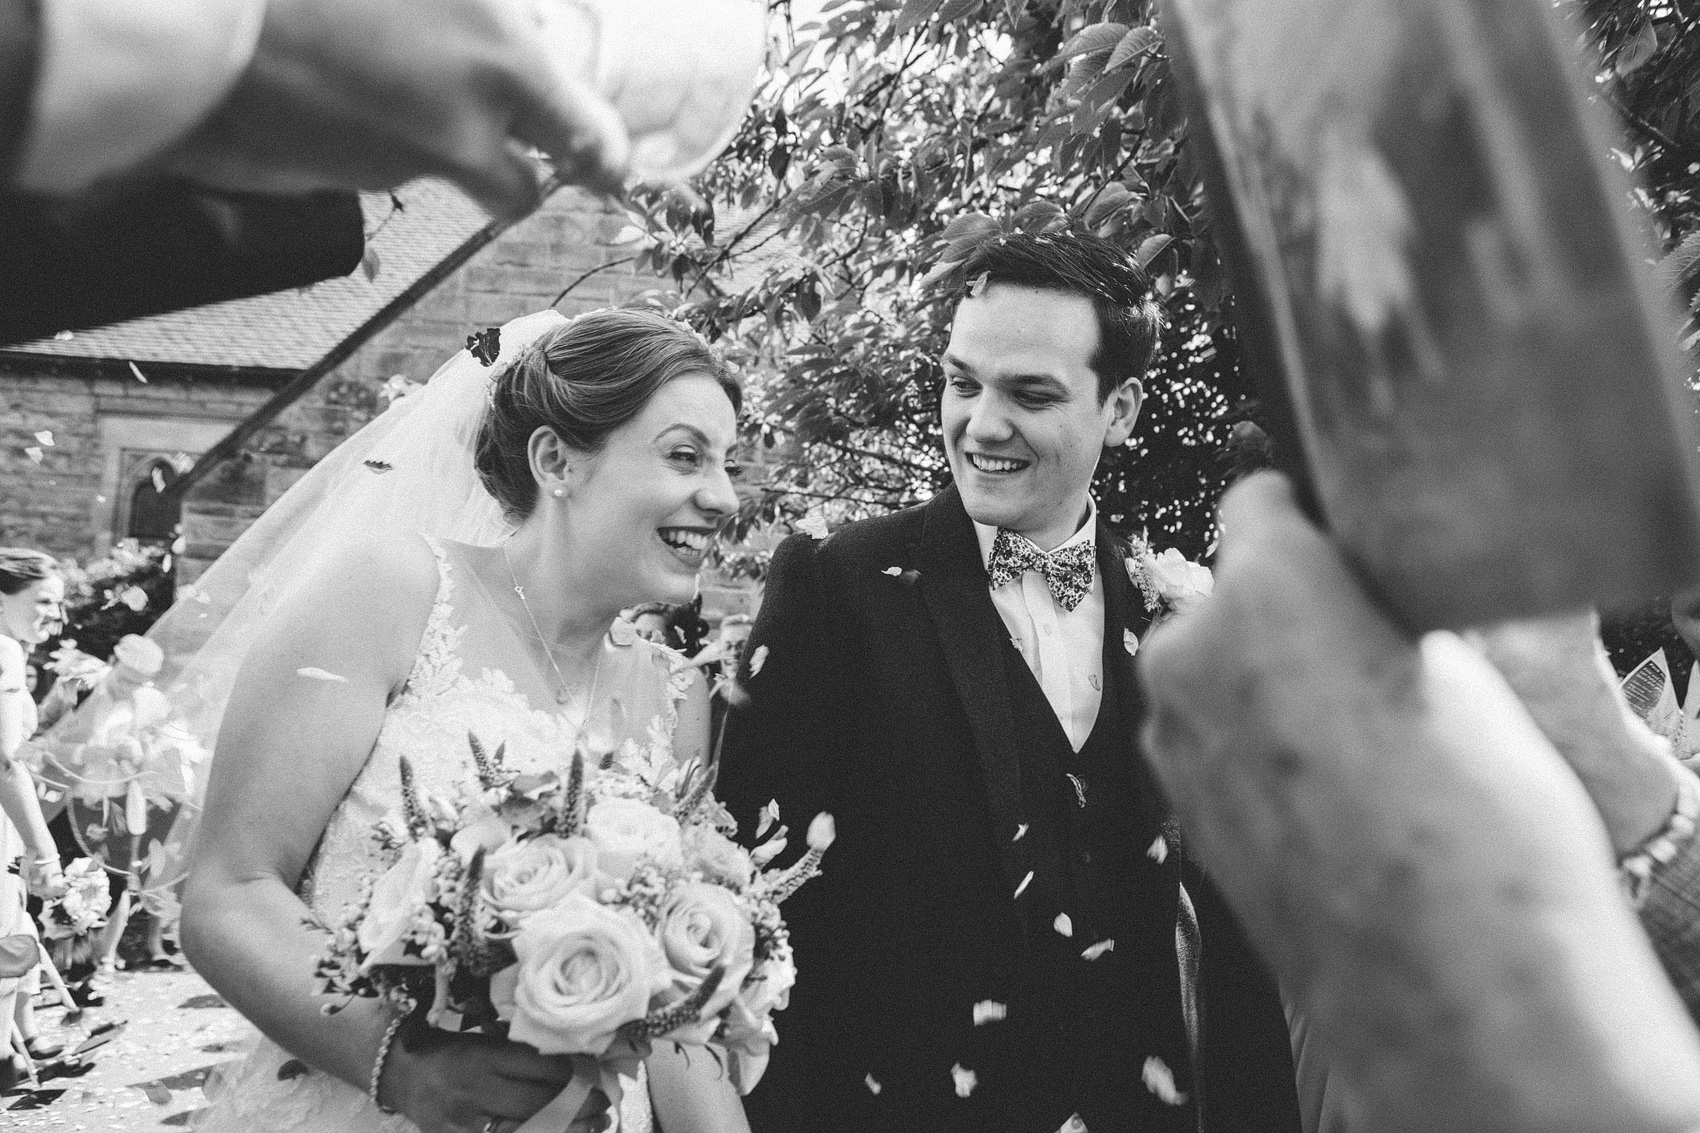 Dilhorne_Village_Hall_Wedding_Photography_-_14_.jpg